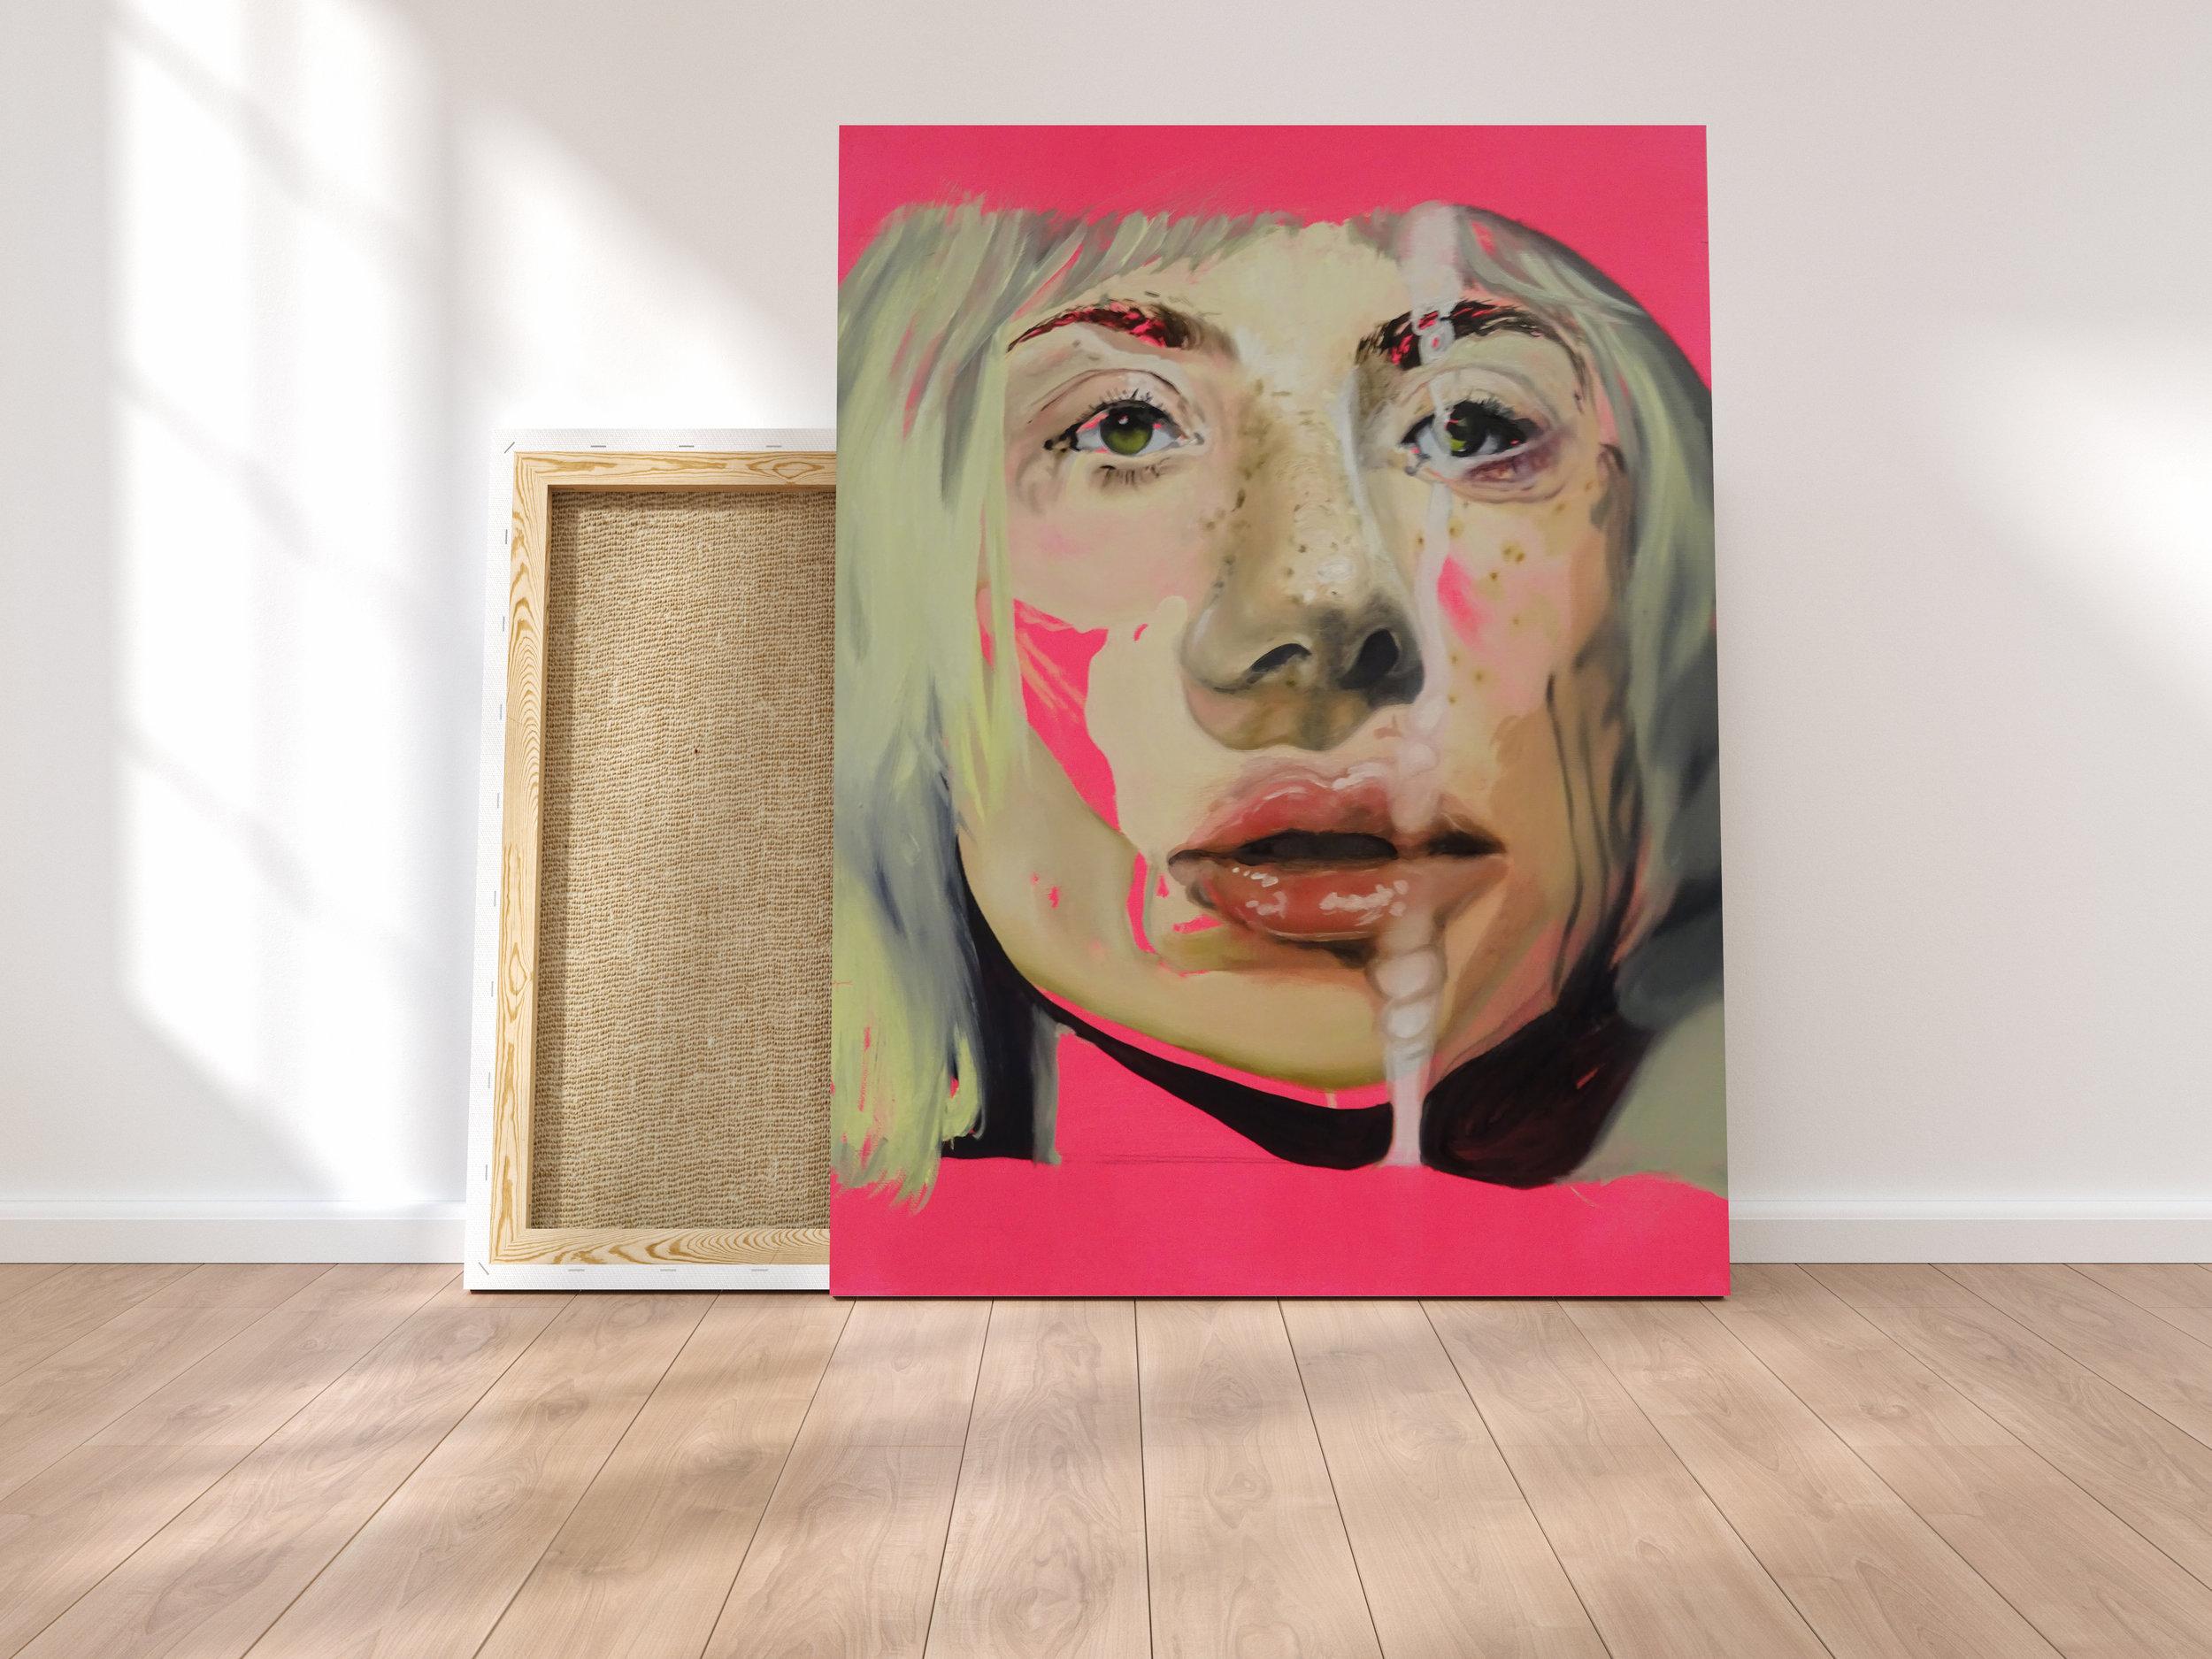 Oil & Acrylic on Canvas -45.5 (H) x 35.5 (W) x 1.8 (D) cm - reborn (2018)